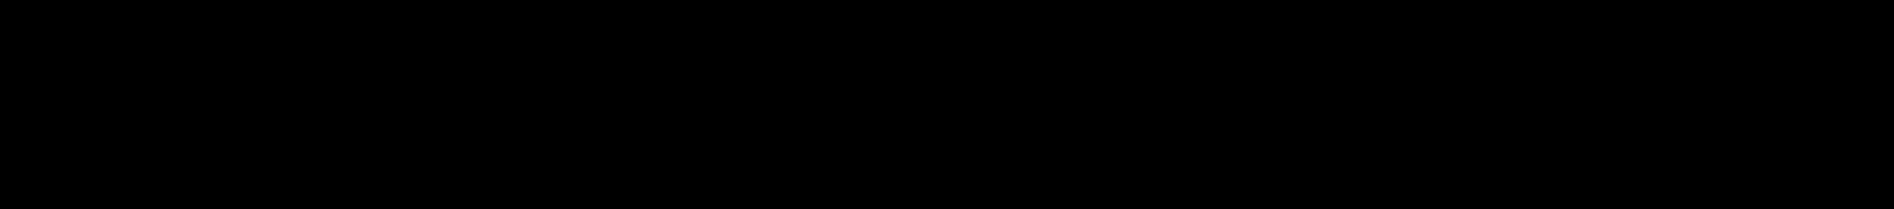 Dr. Khana signature